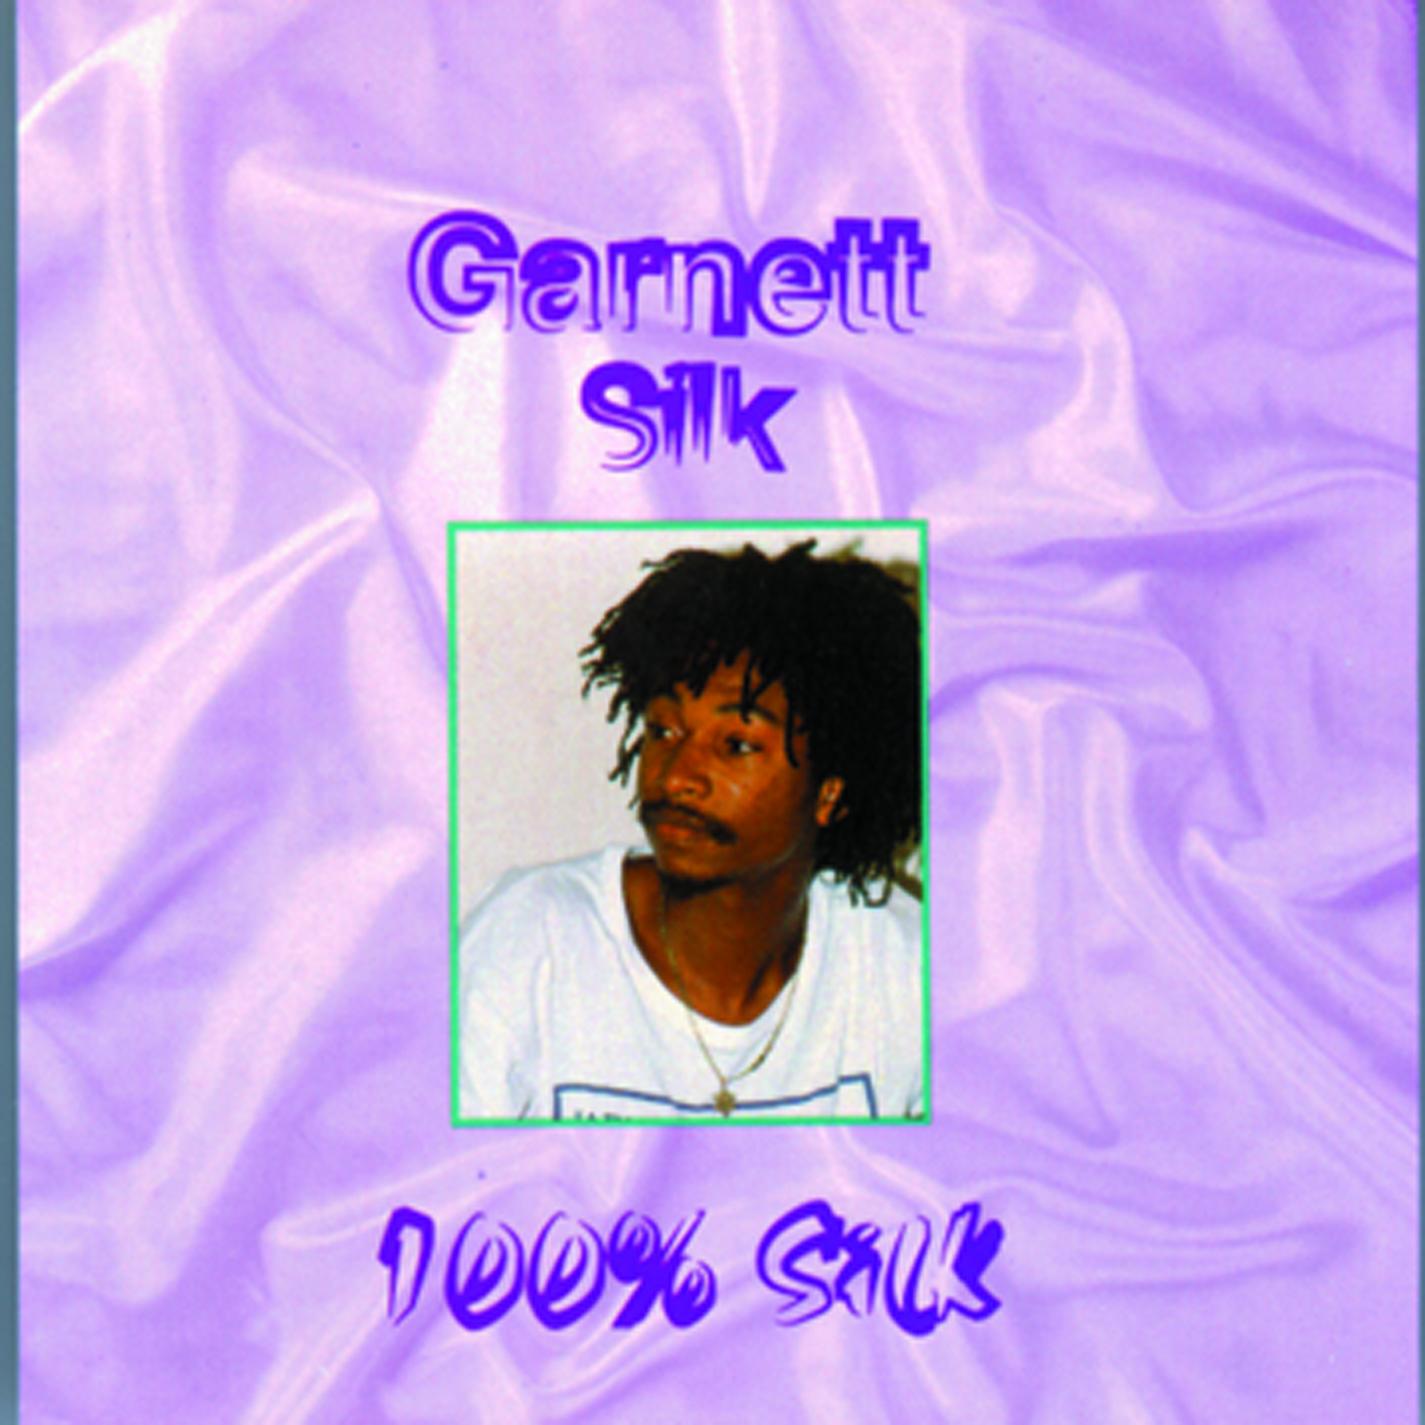 Garnett Silk – 100% Silk